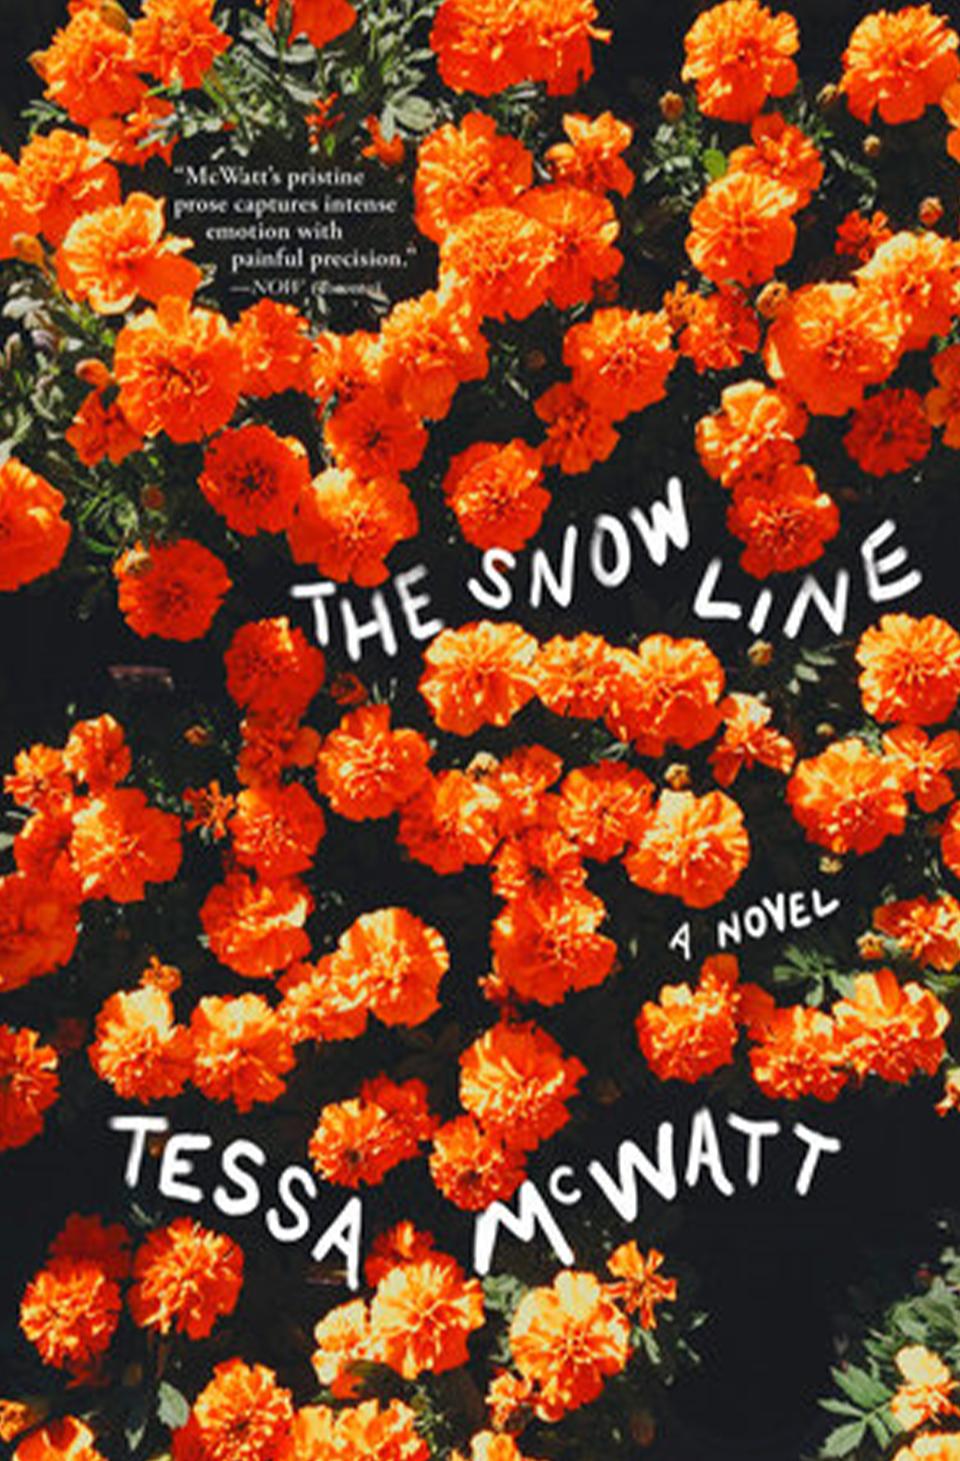 The Snow Line by Tessa McWatt